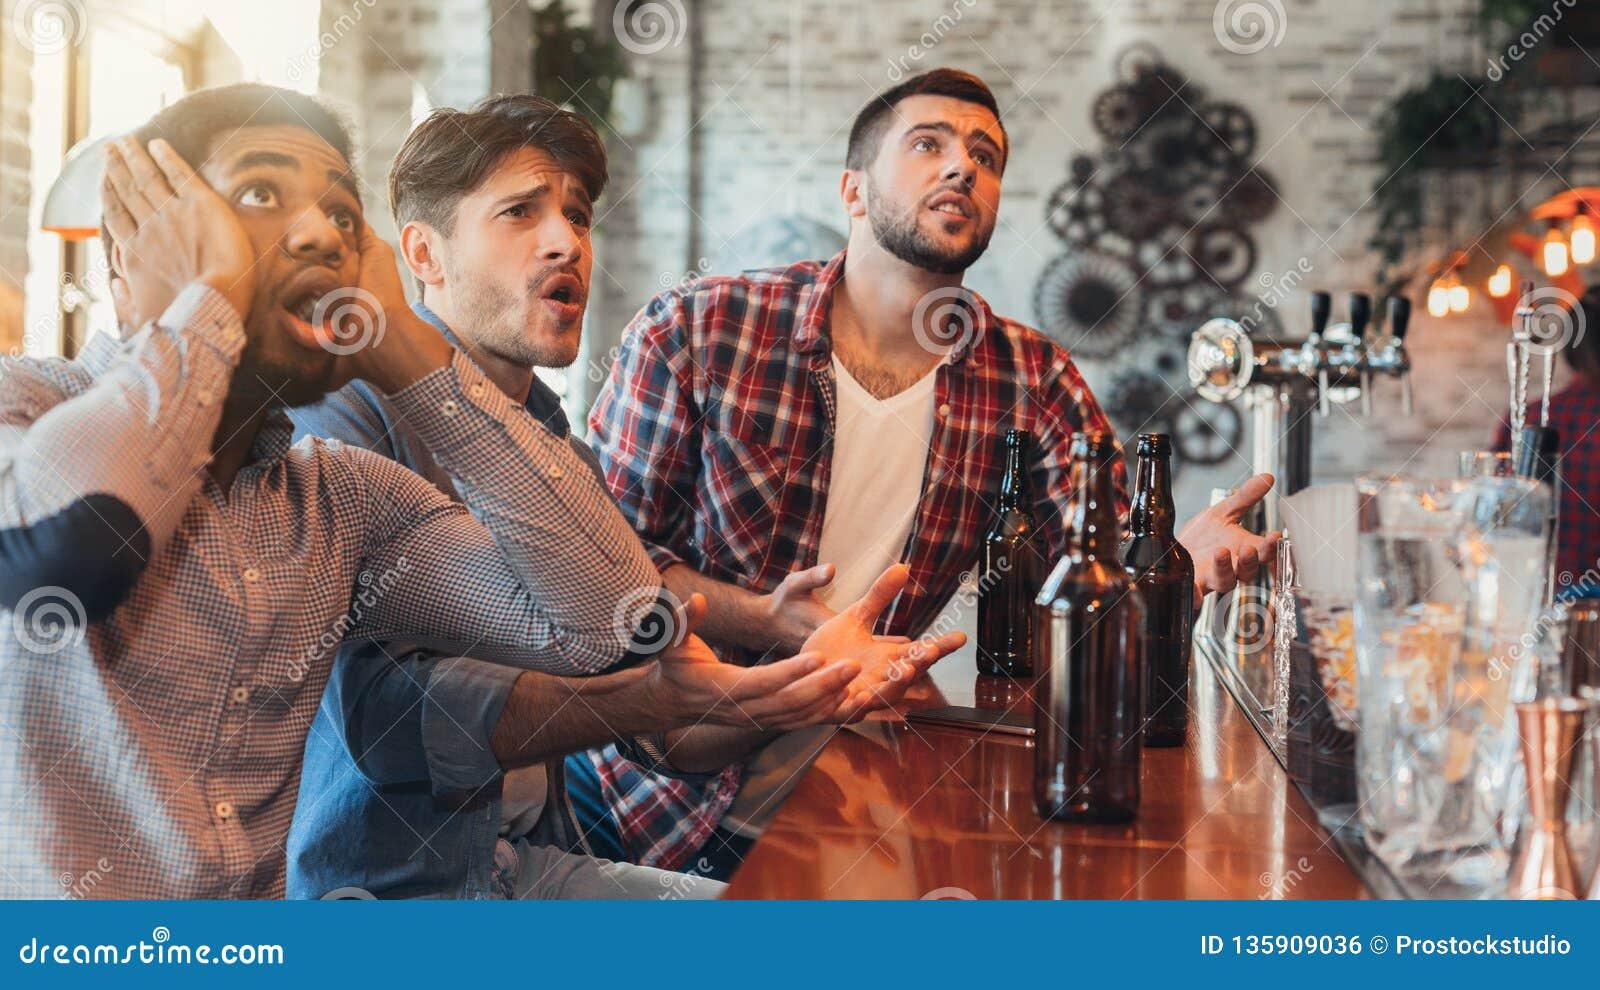 Sad male friends watching football at bar